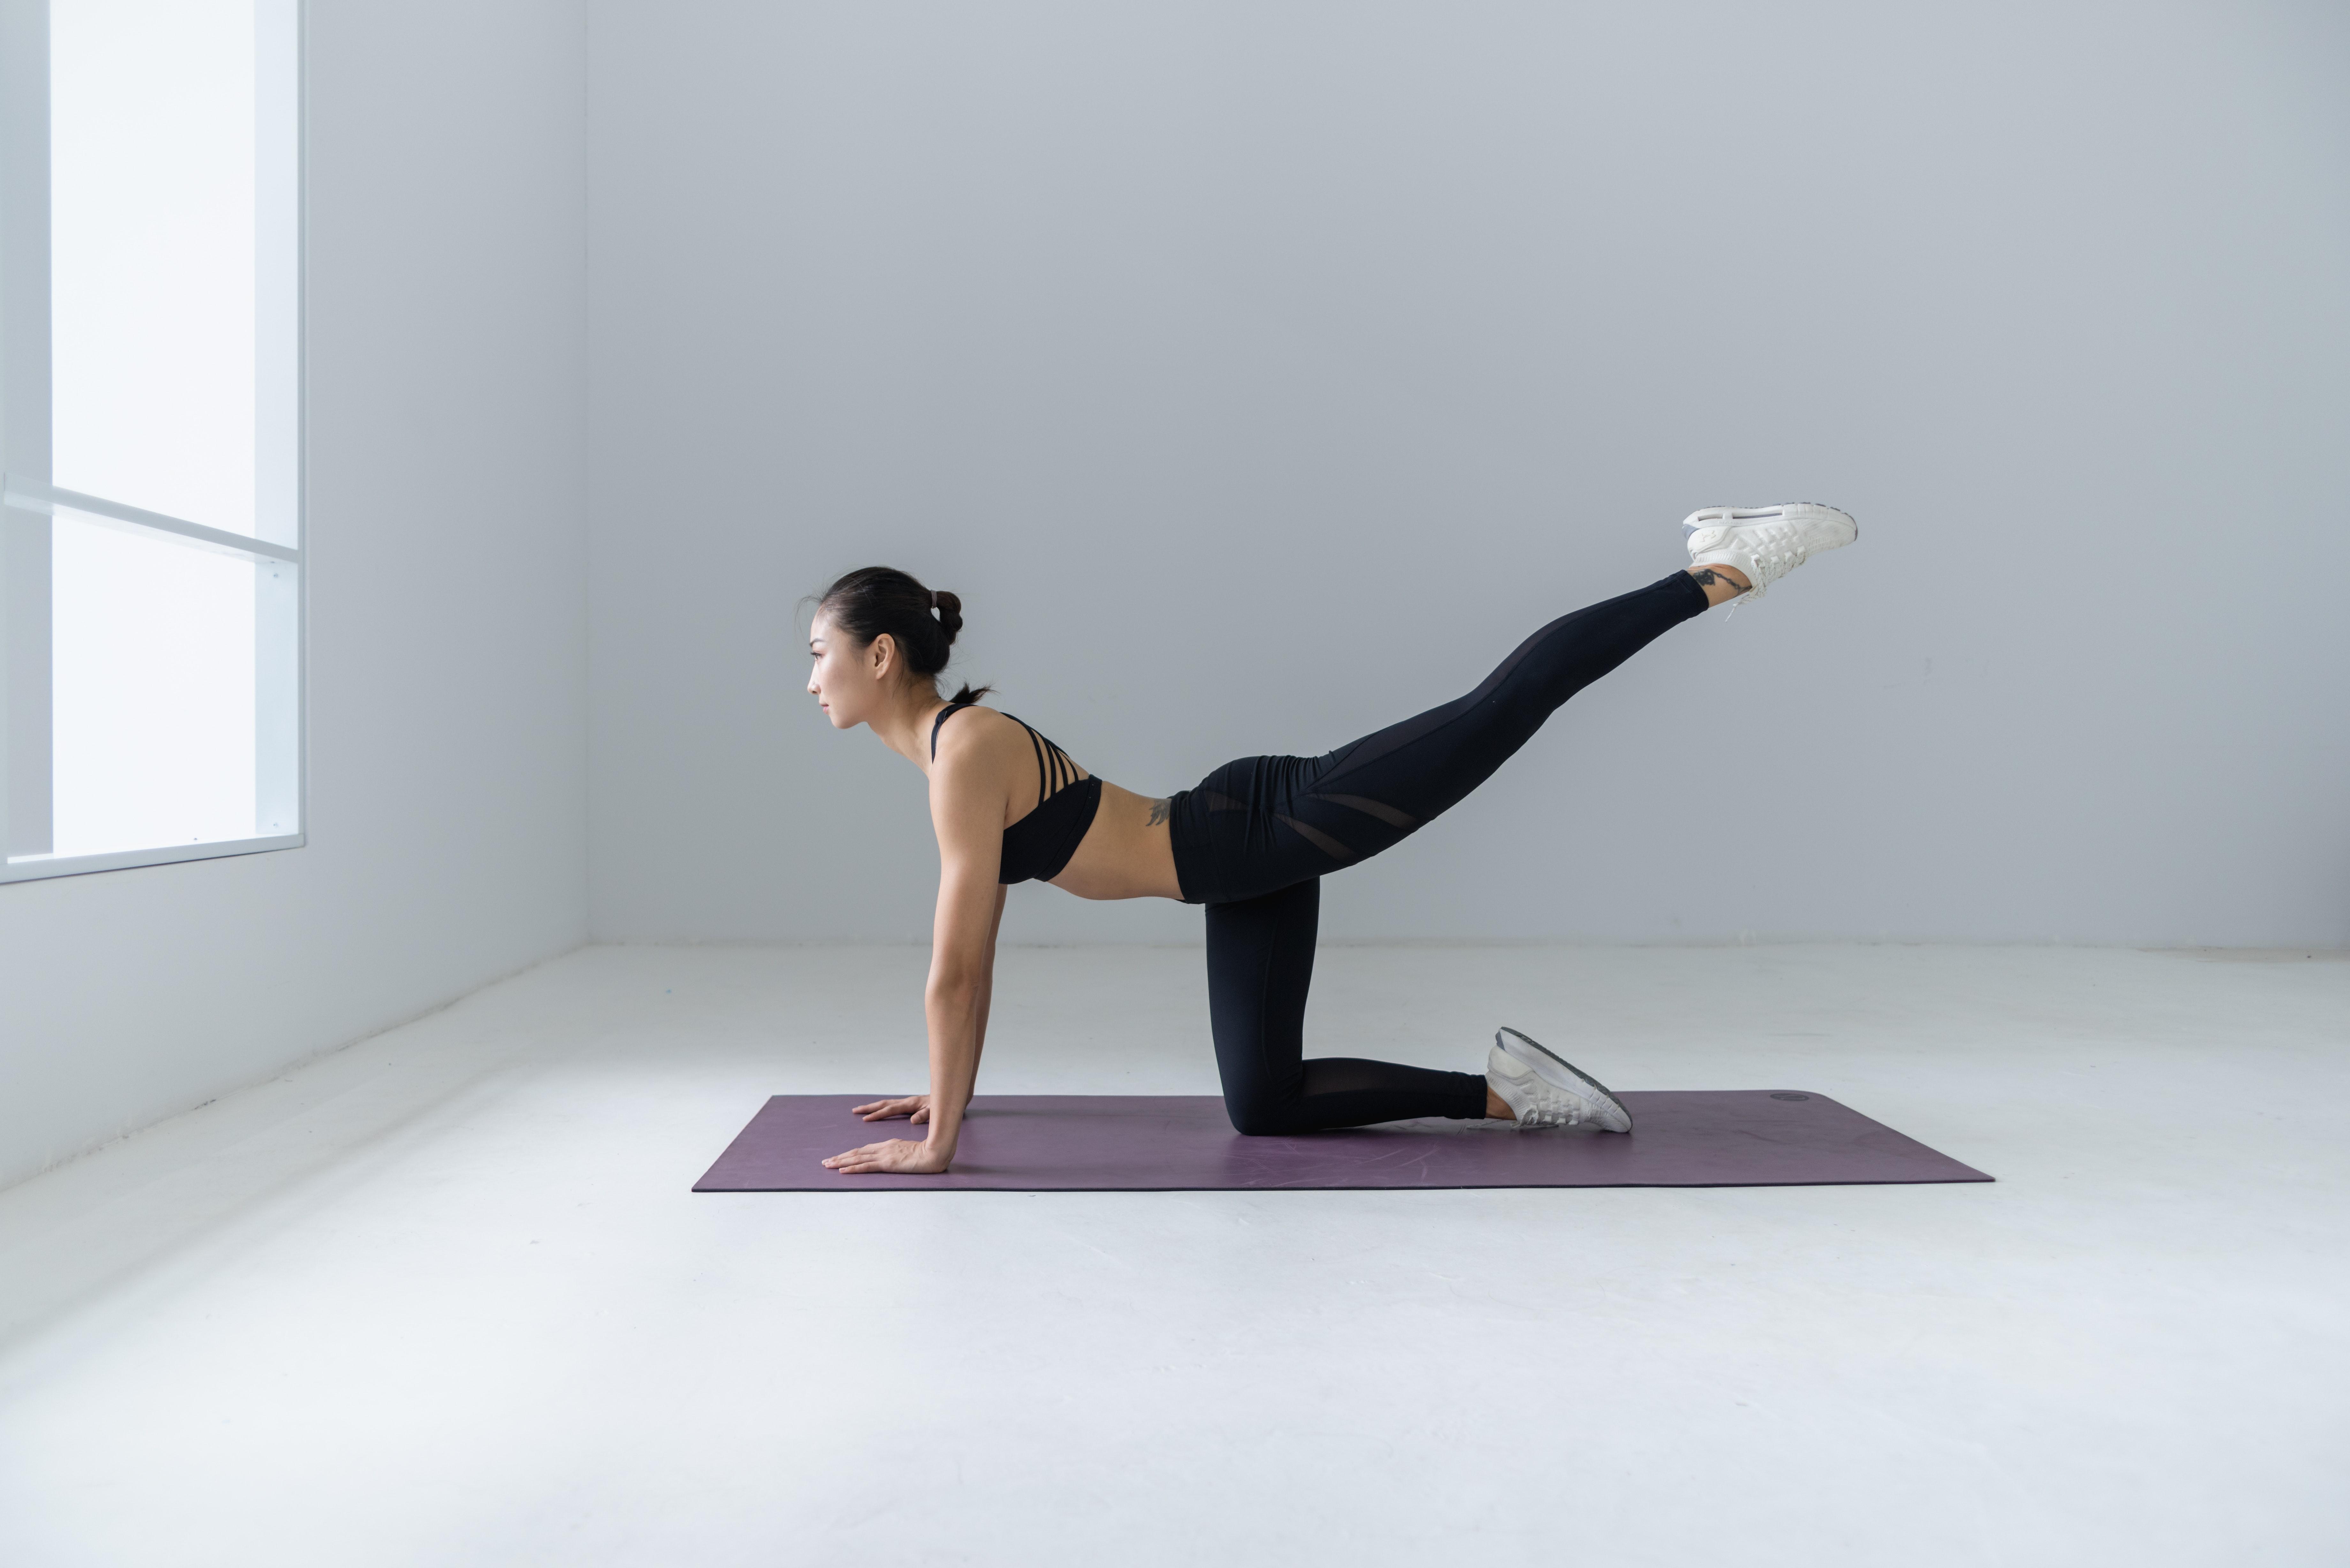 Photo Of Woman Doing Yoga Free Stock Photo